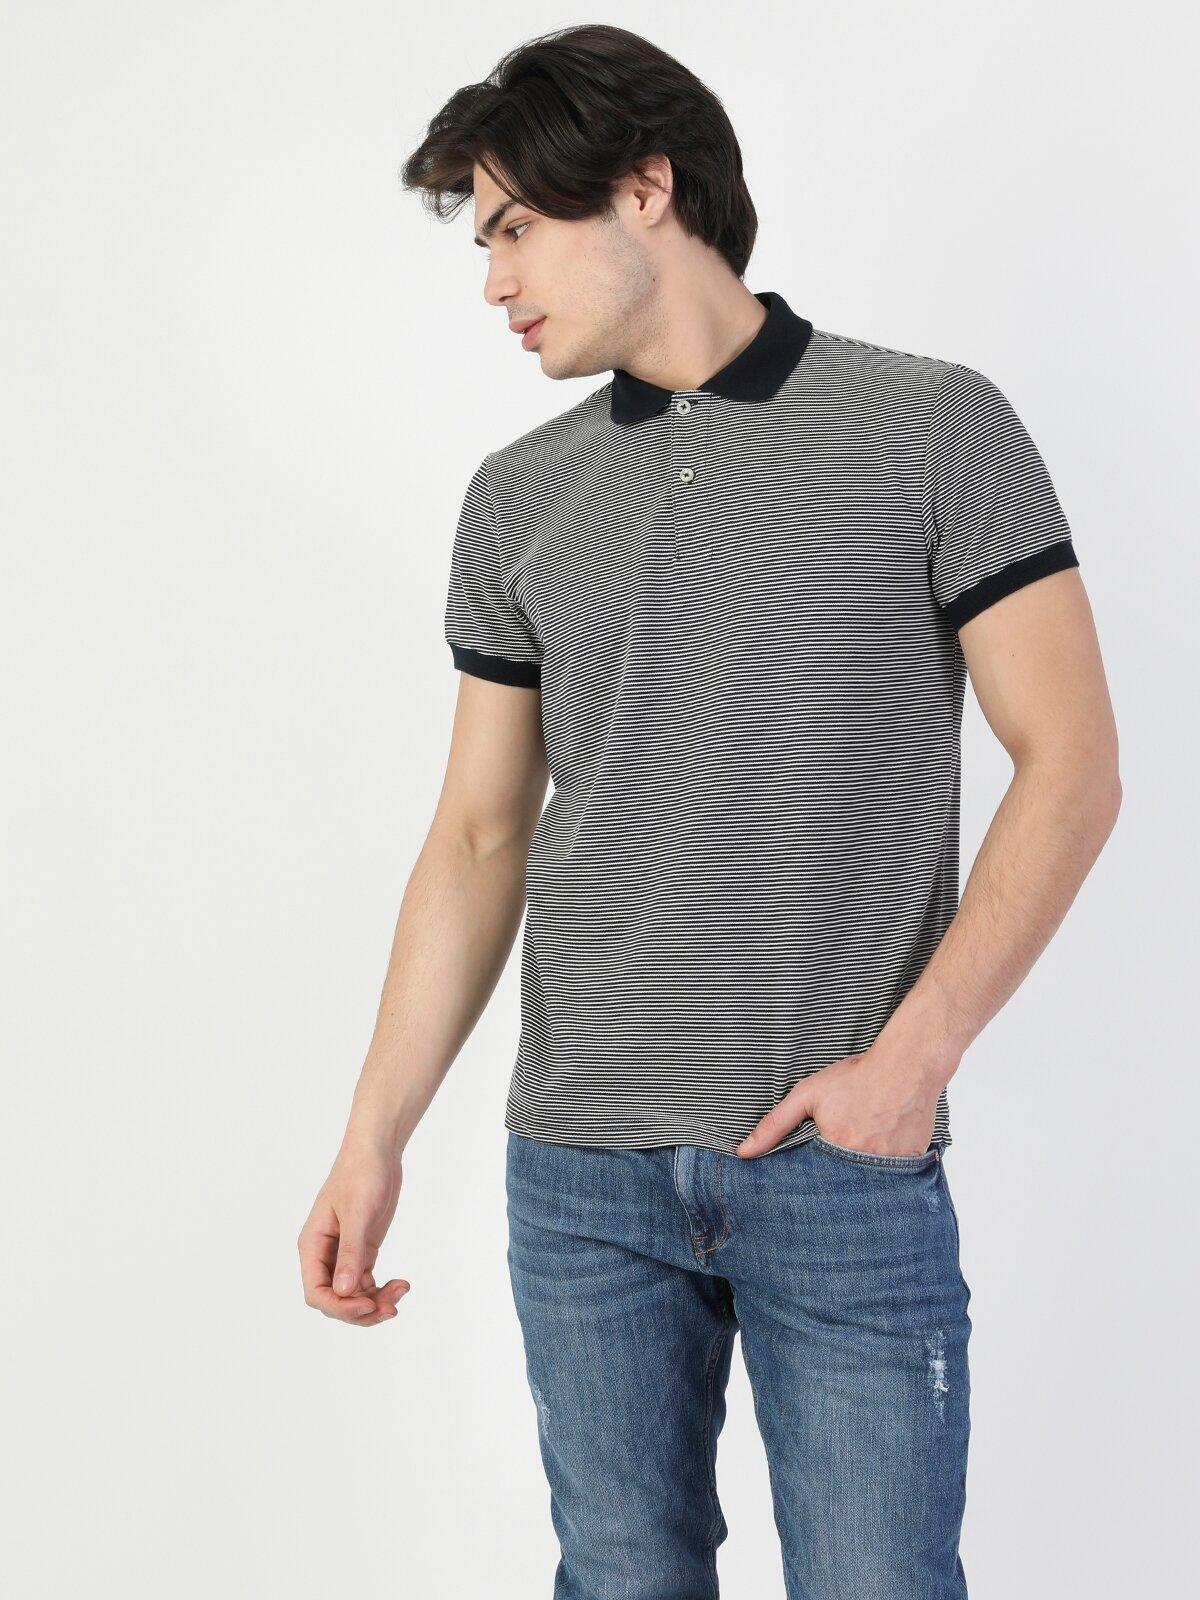 Regular Fit Standart Kol Polo Yaka Lacivert Erkek Kısa Kol Polo Tişört